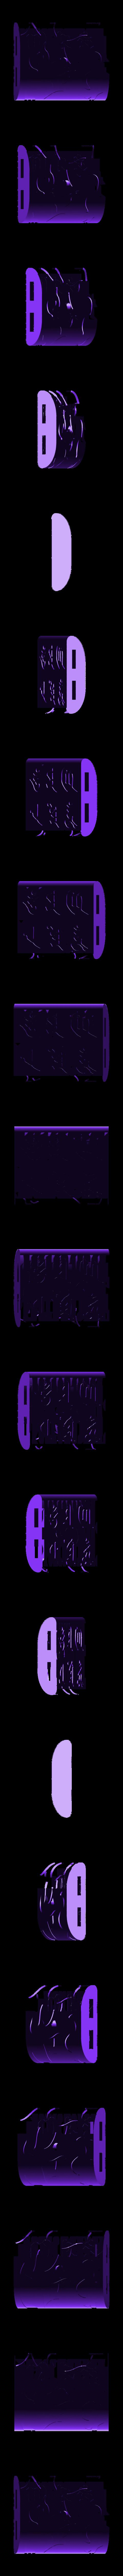 UpLid-MainPart.stl Download free STL file Prayer wheel (With frame) • 3D printing template, NickChung